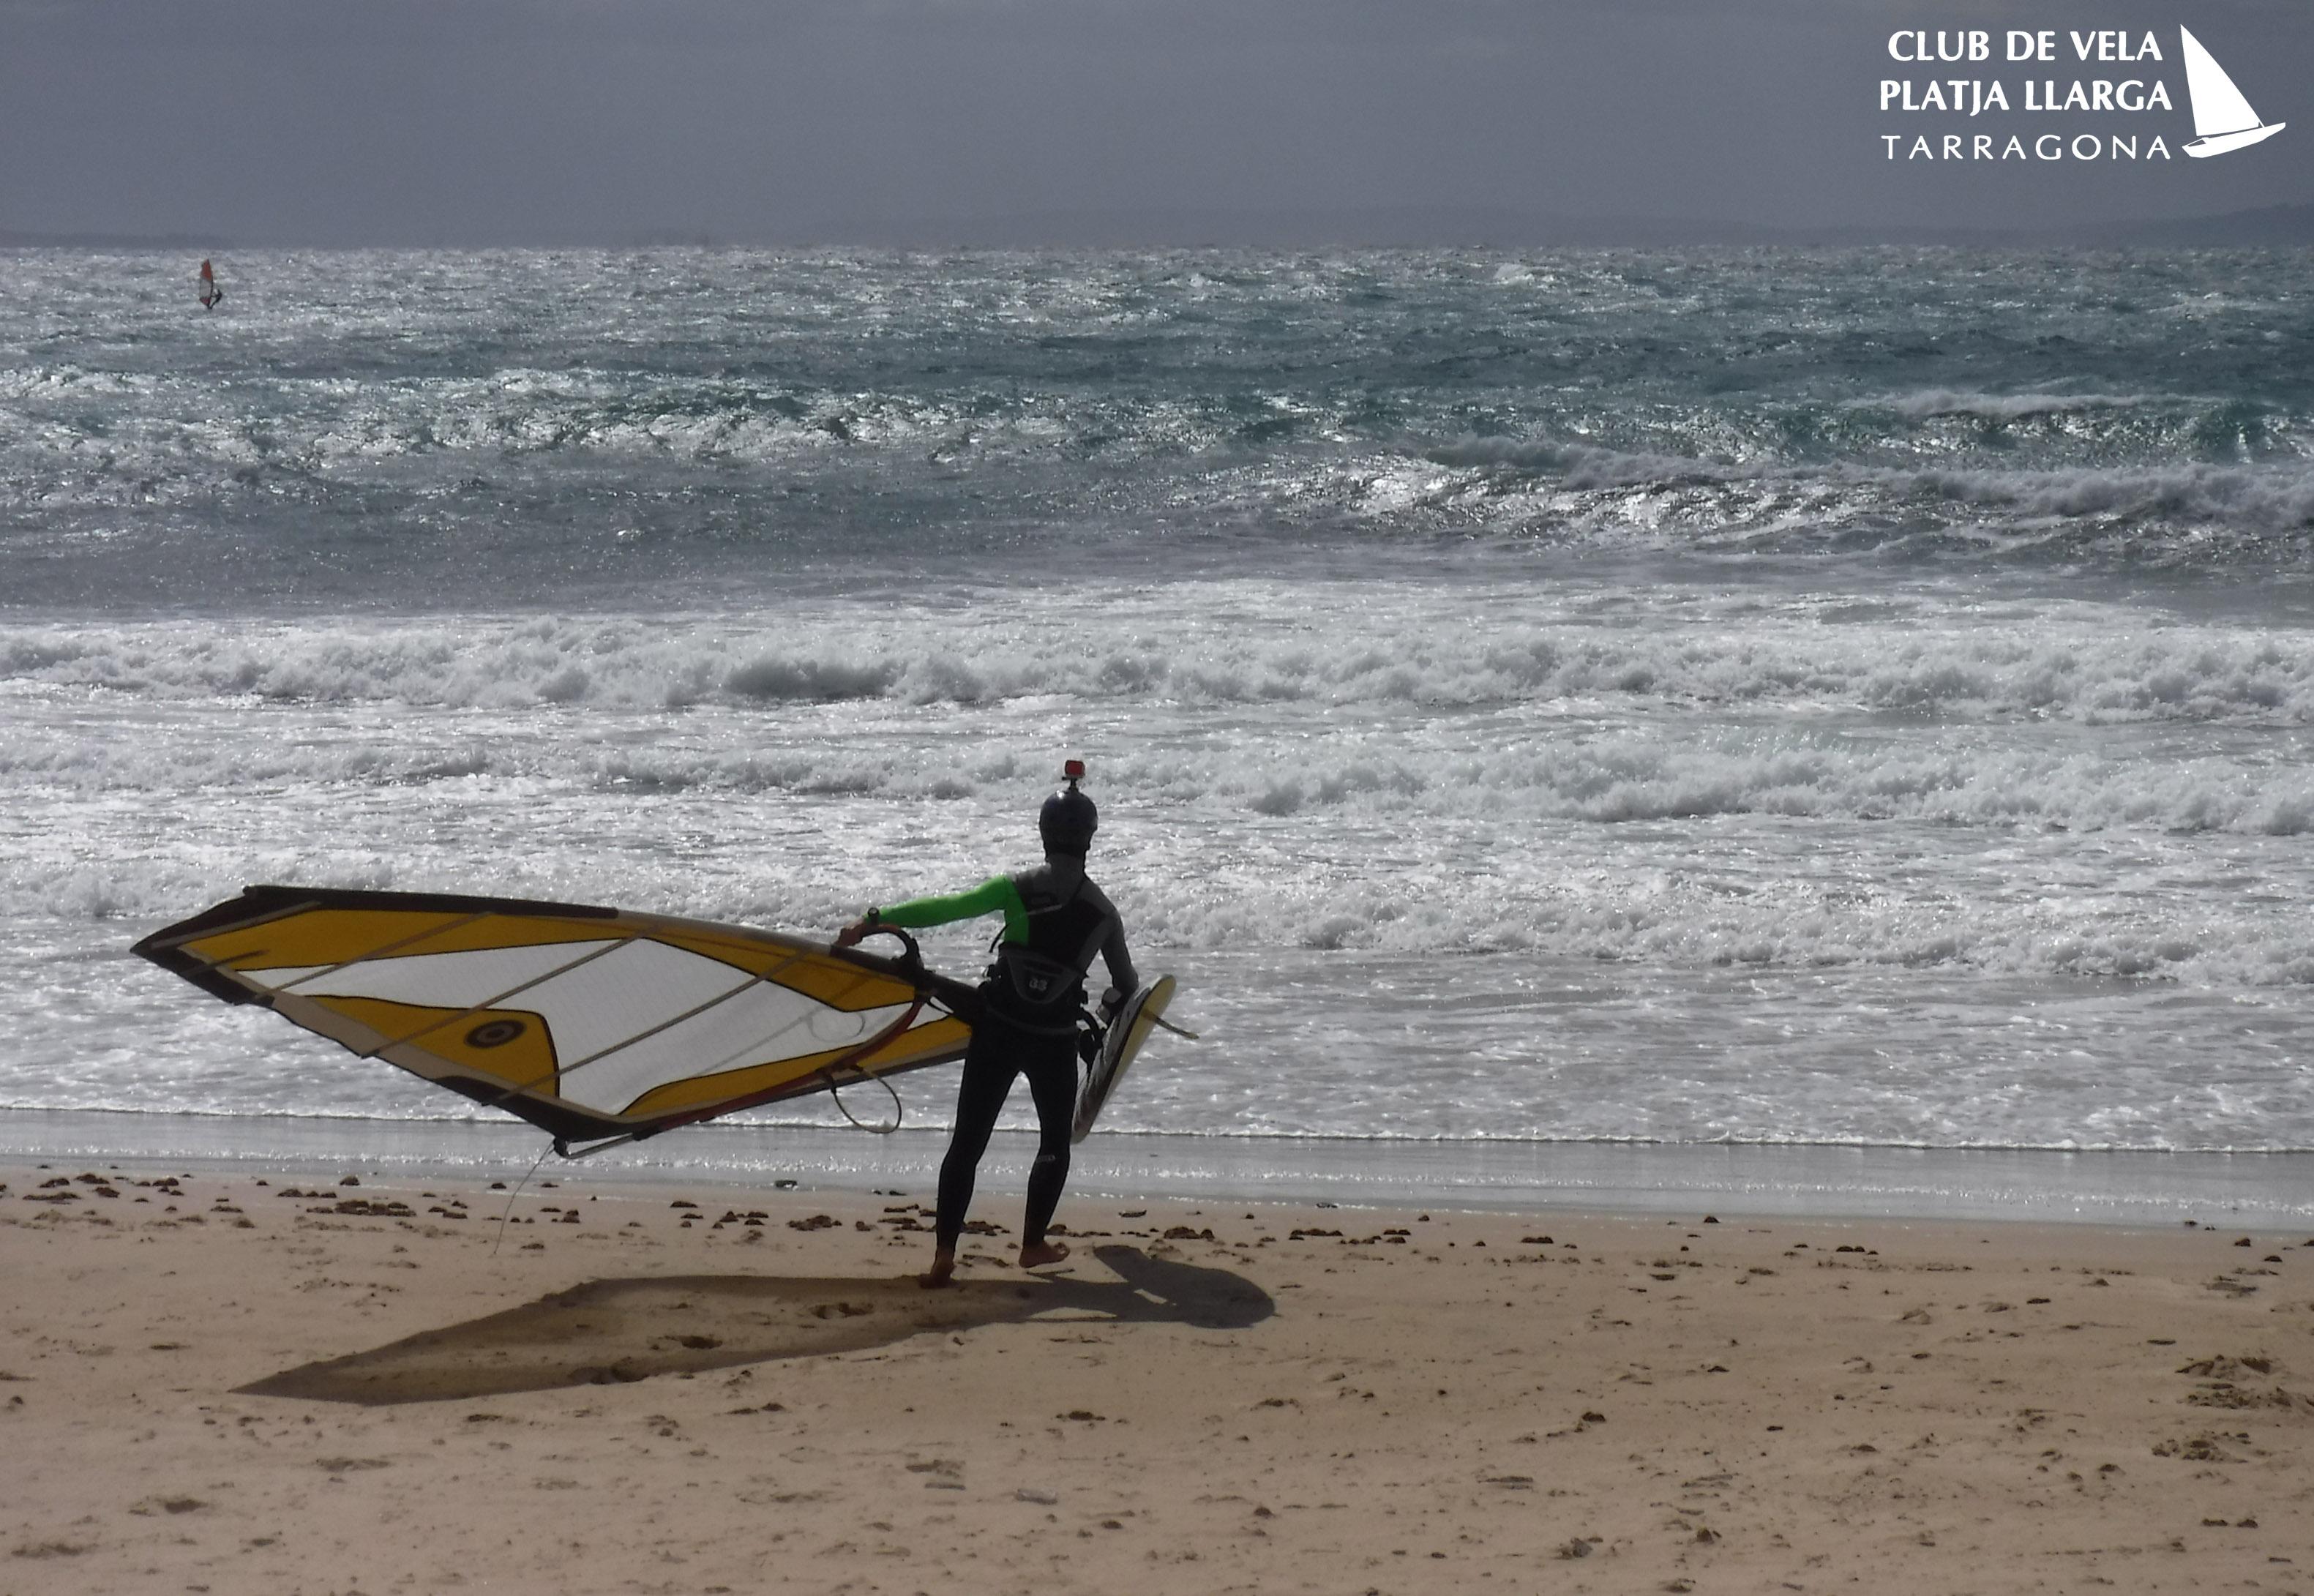 let's go windsurfing Tarifa